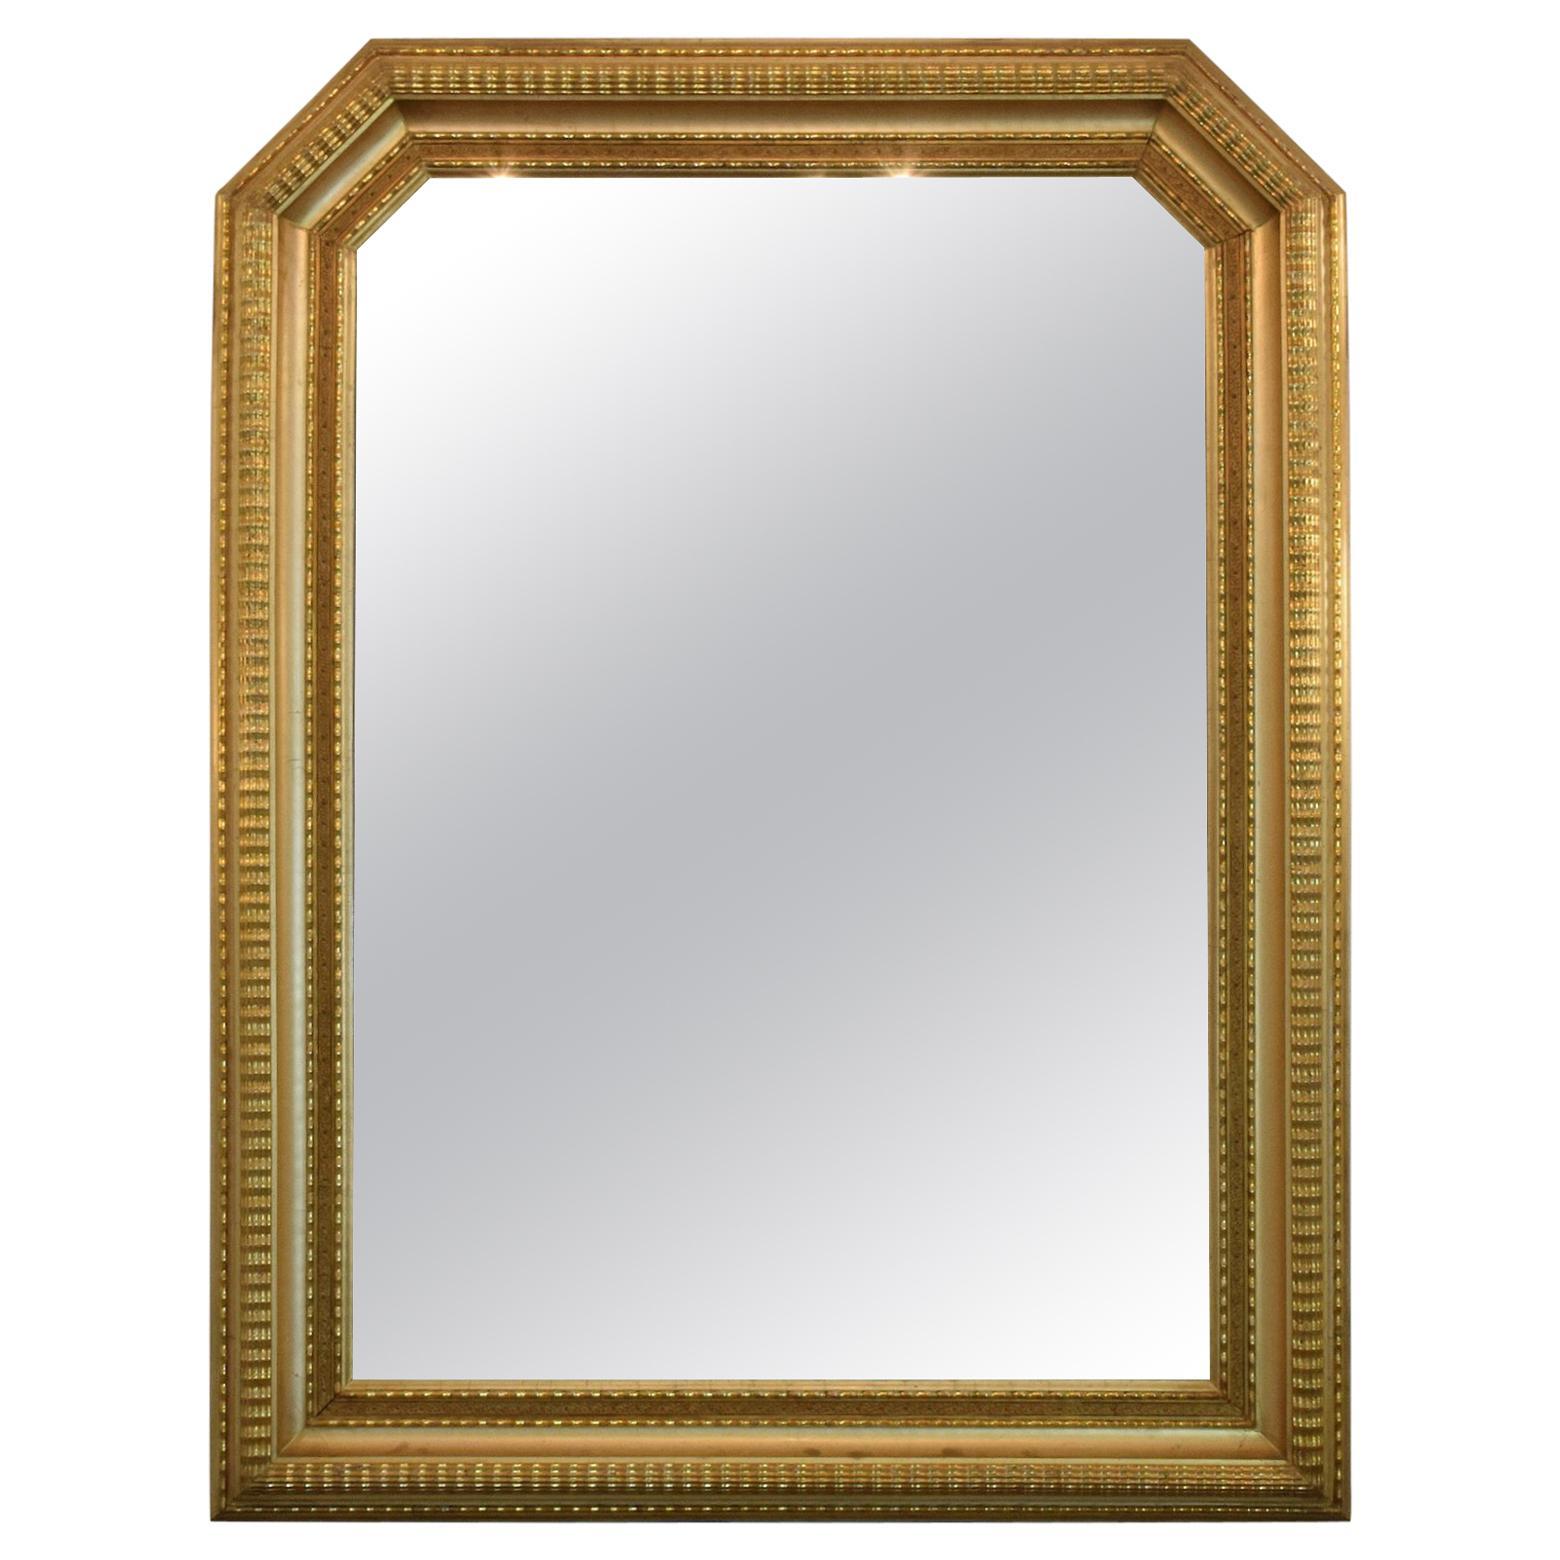 20th Century Italian Octagonal Giltwood Mirror, 1940s